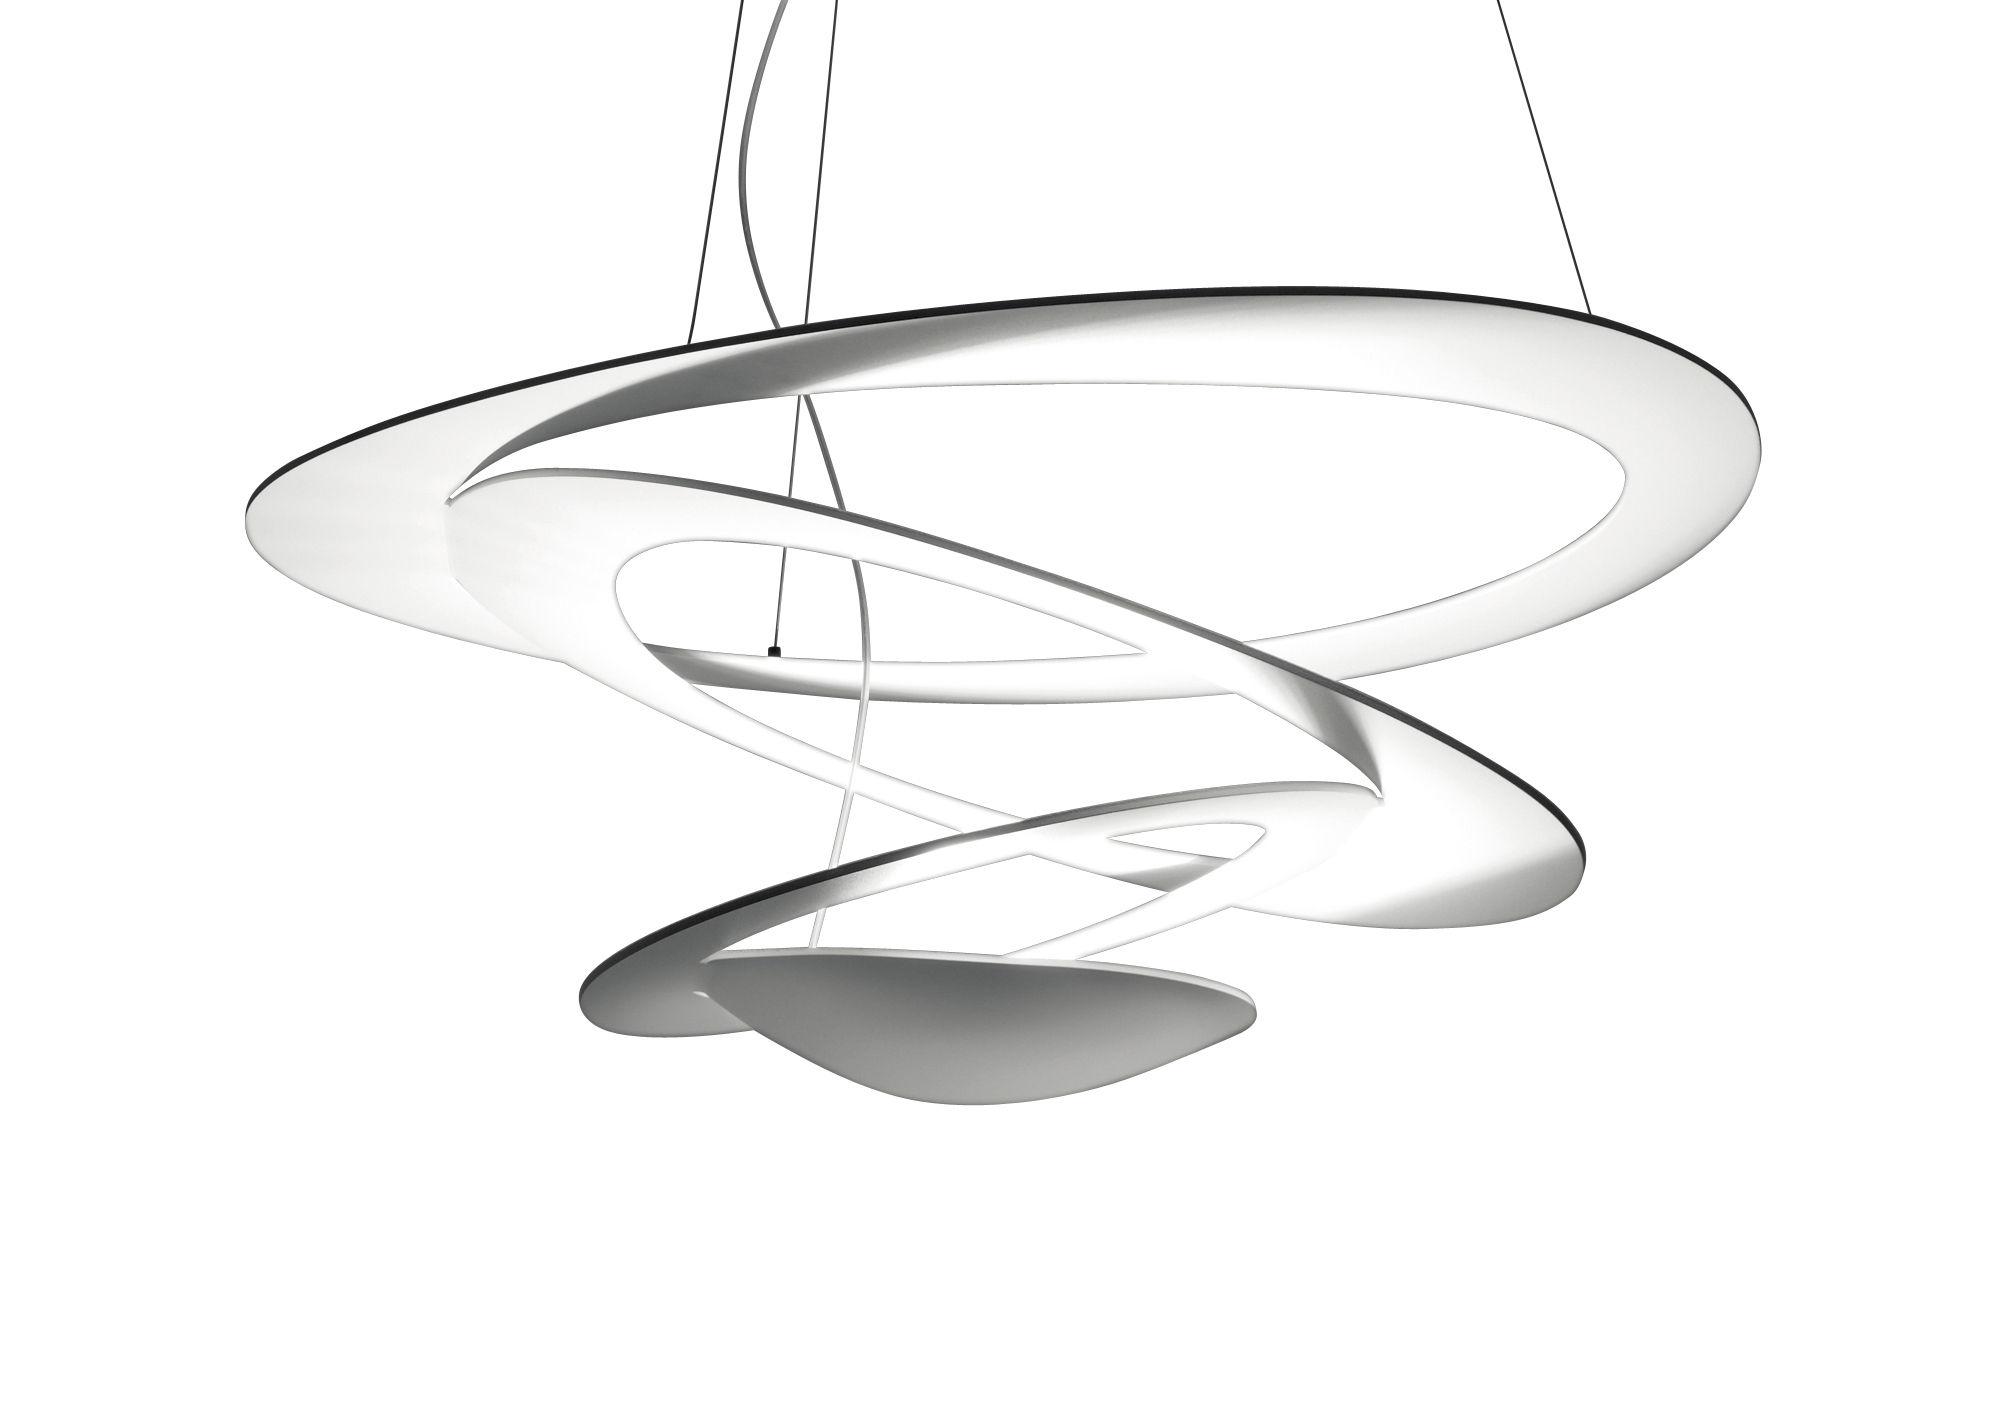 Leuchten - Pendelleuchten - Pirce Micro Pendelleuchte LED / Ø 48 cm - Artemide - Weiβ - klarlackbeschichtetes Aluminium